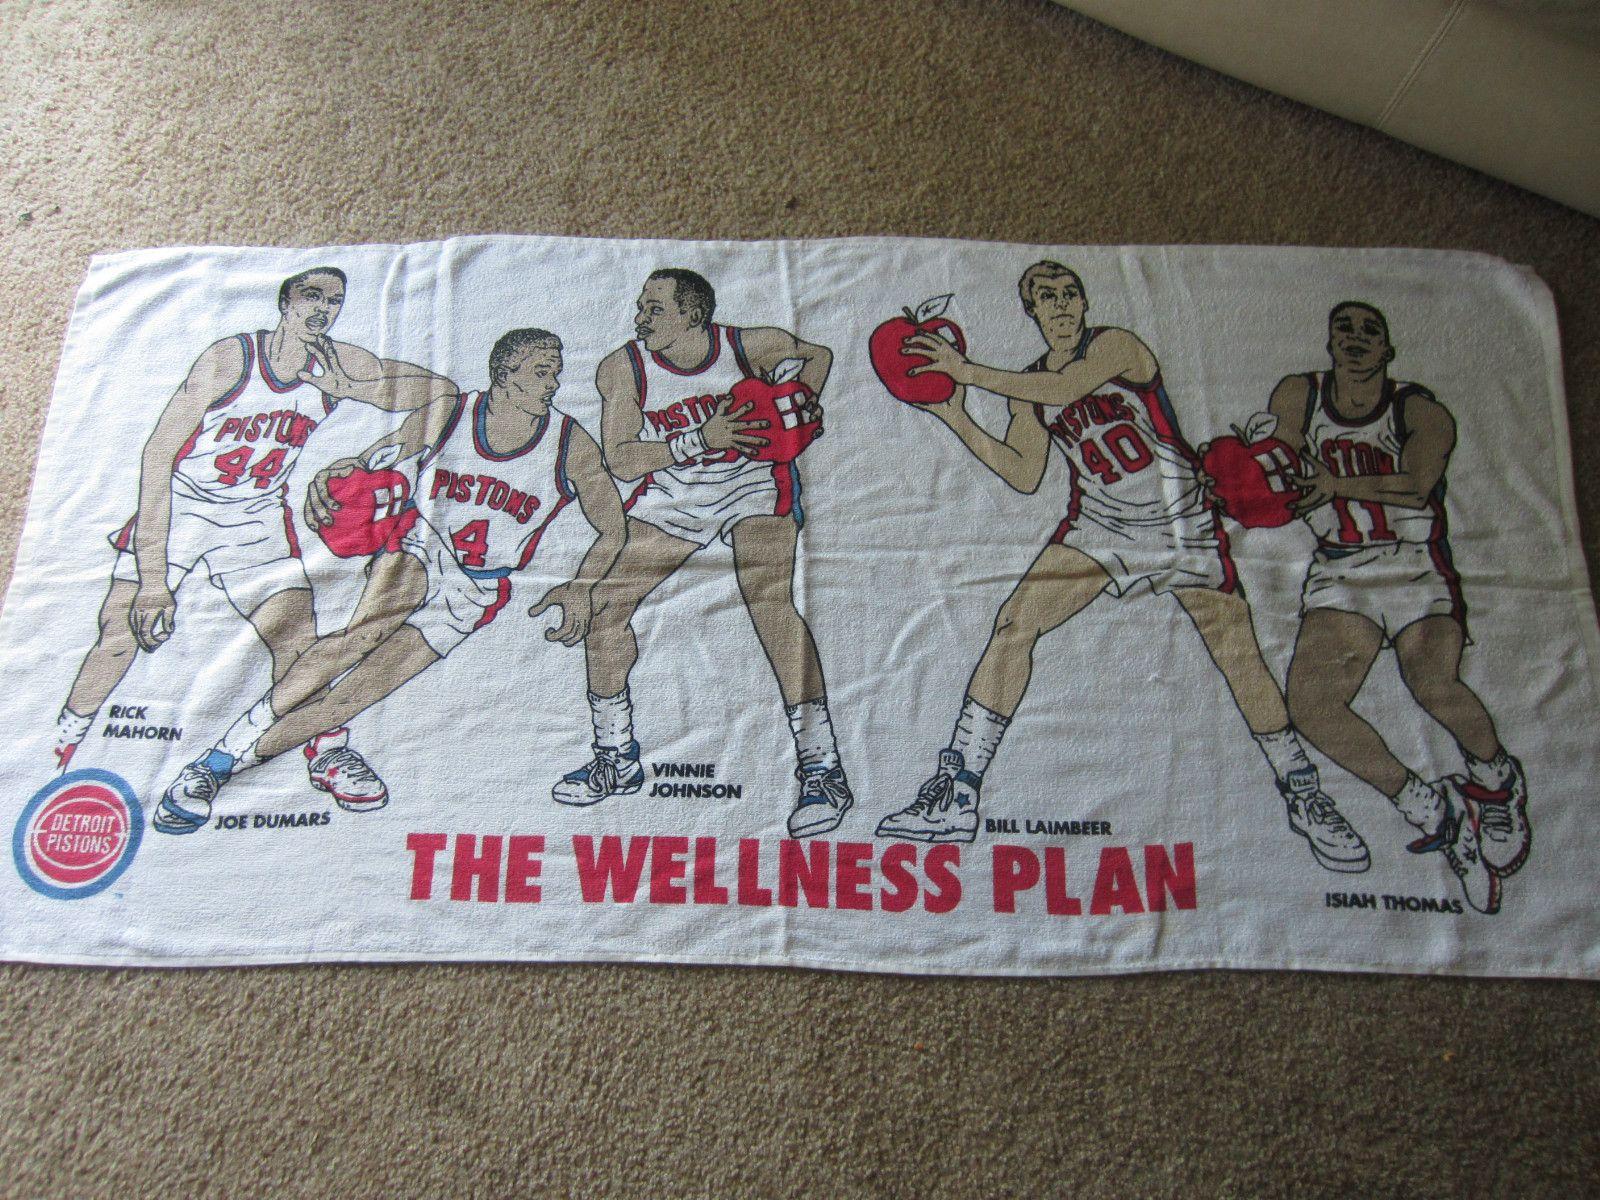 Detroit Pistons Vintage Beach Towel Isiah Thomas Joe Dumars Rick Mahorn Sga Ebay Isiah Thomas Detroit Pistons Bad Boys Vintage Textiles